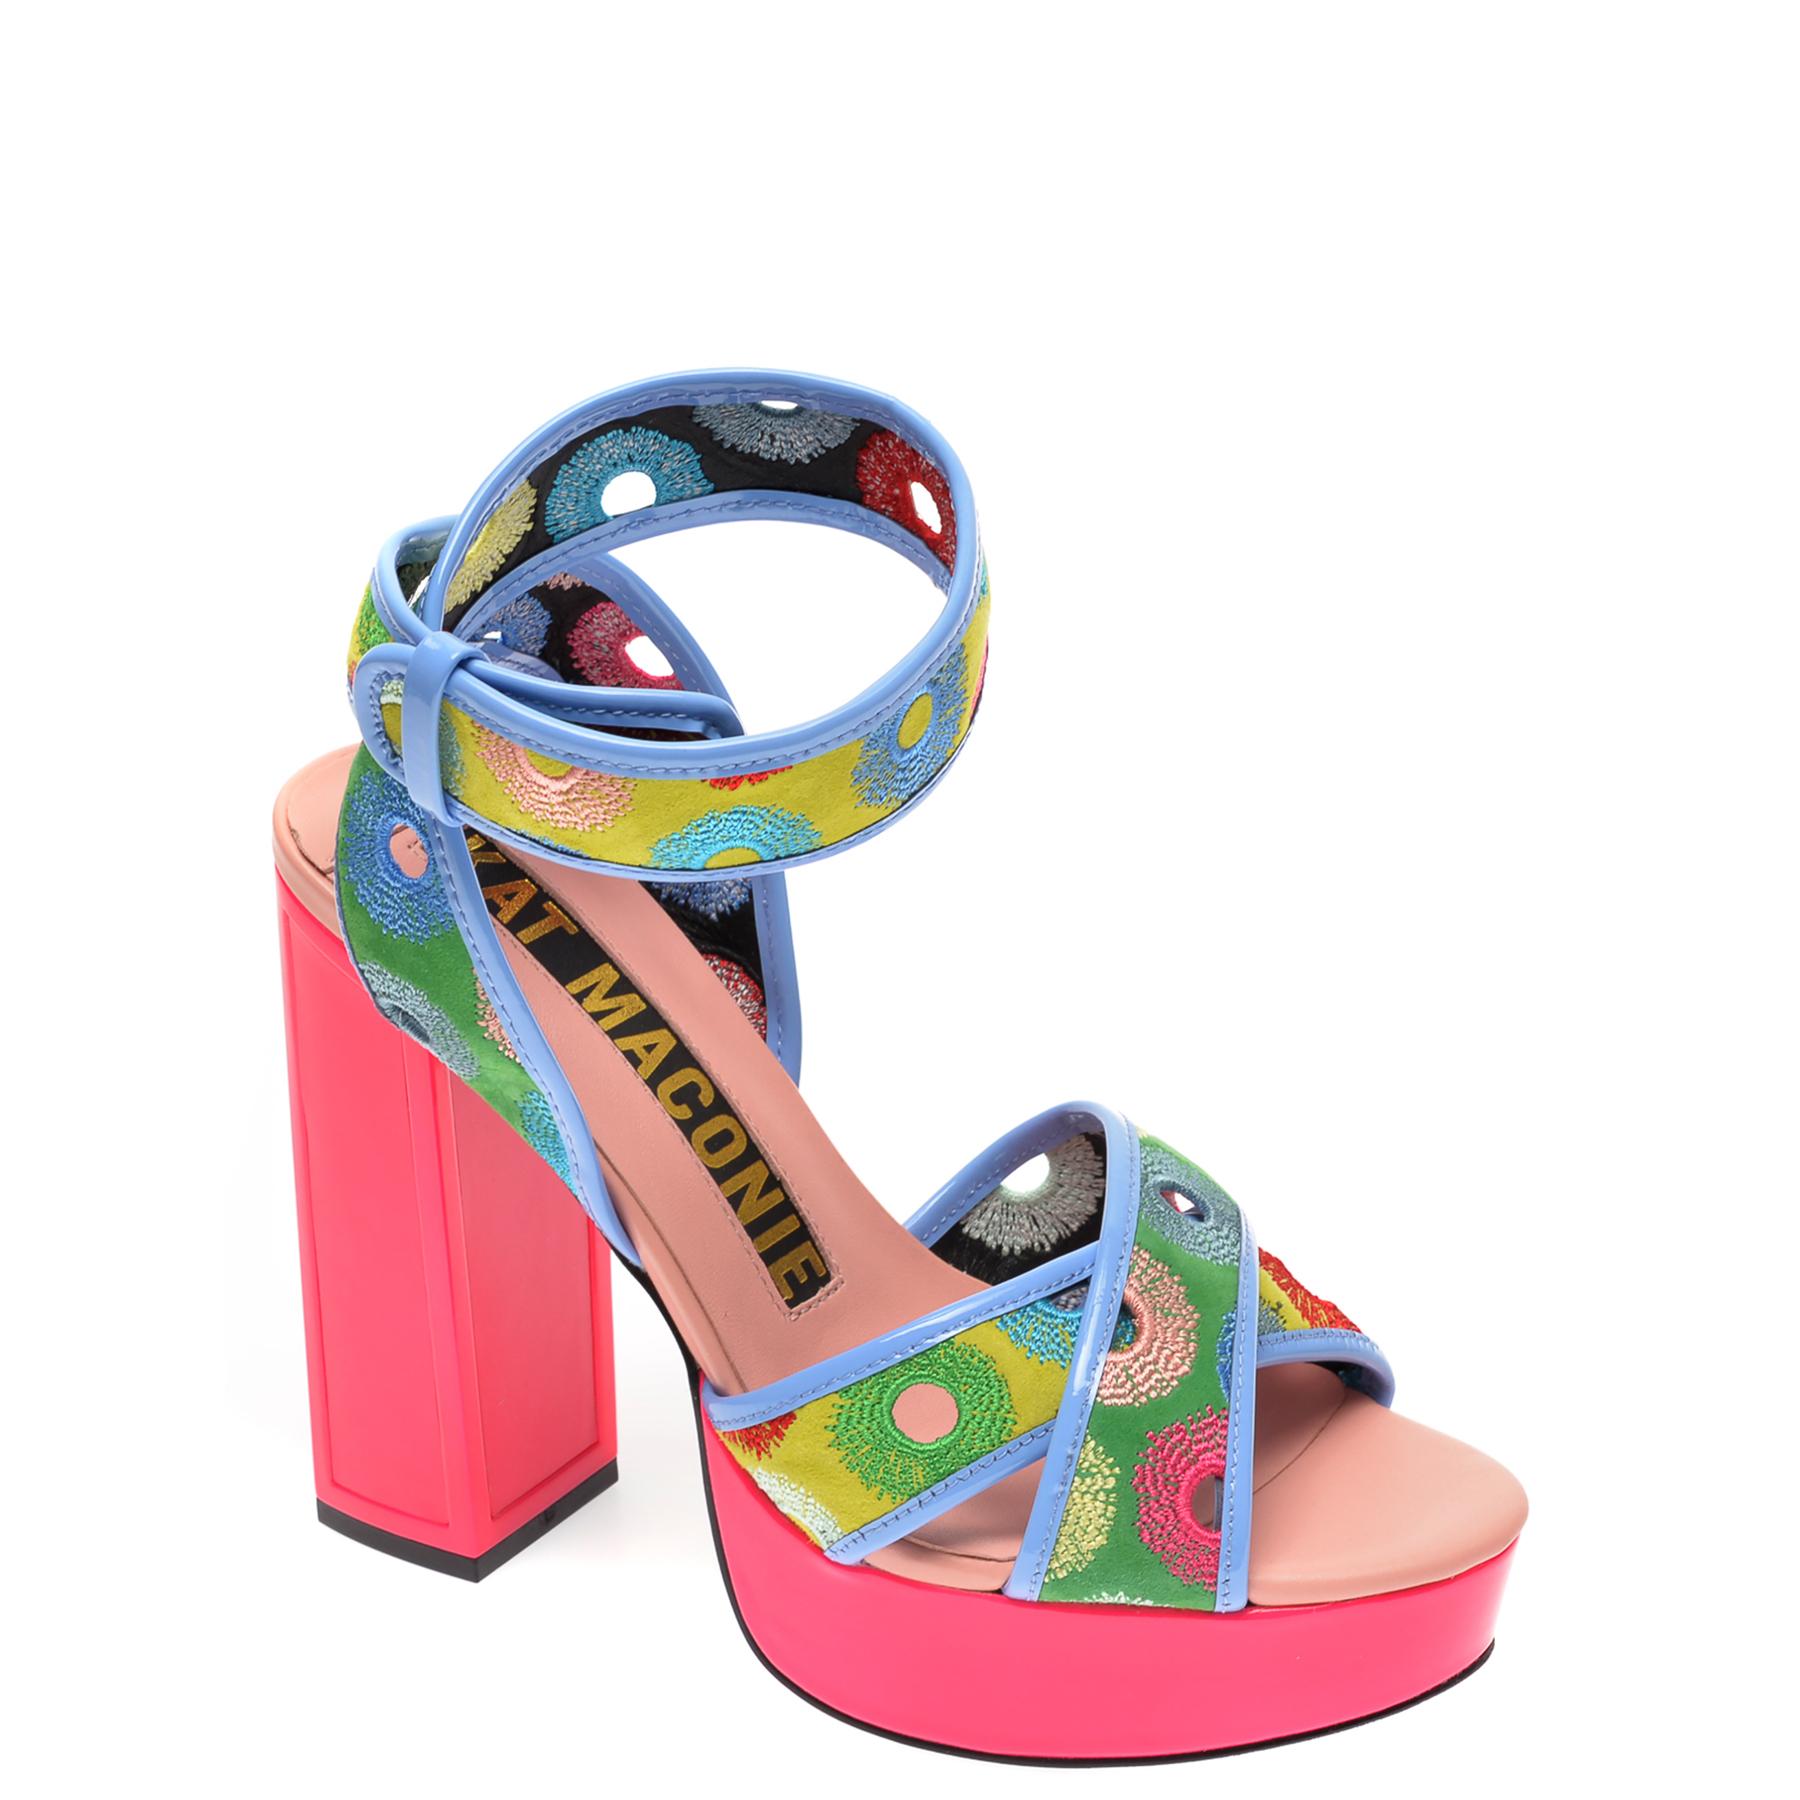 Sandale KAT MACONIE multicolor, CHARLIE, din piele naturala